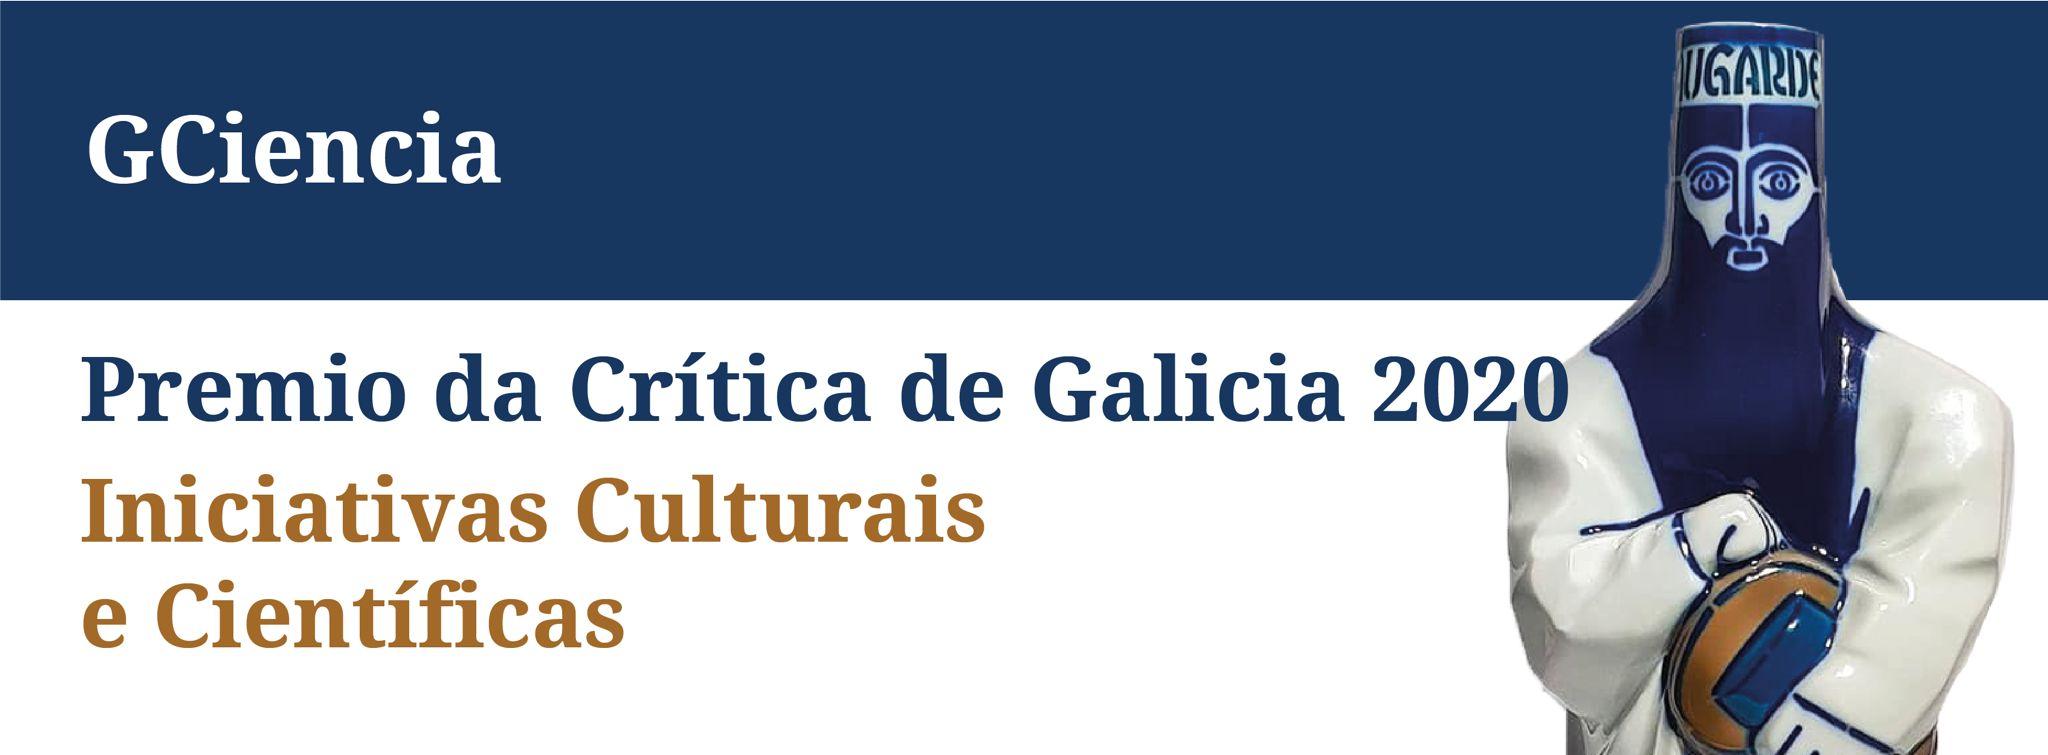 Premio da Crítica de Galicia 2020